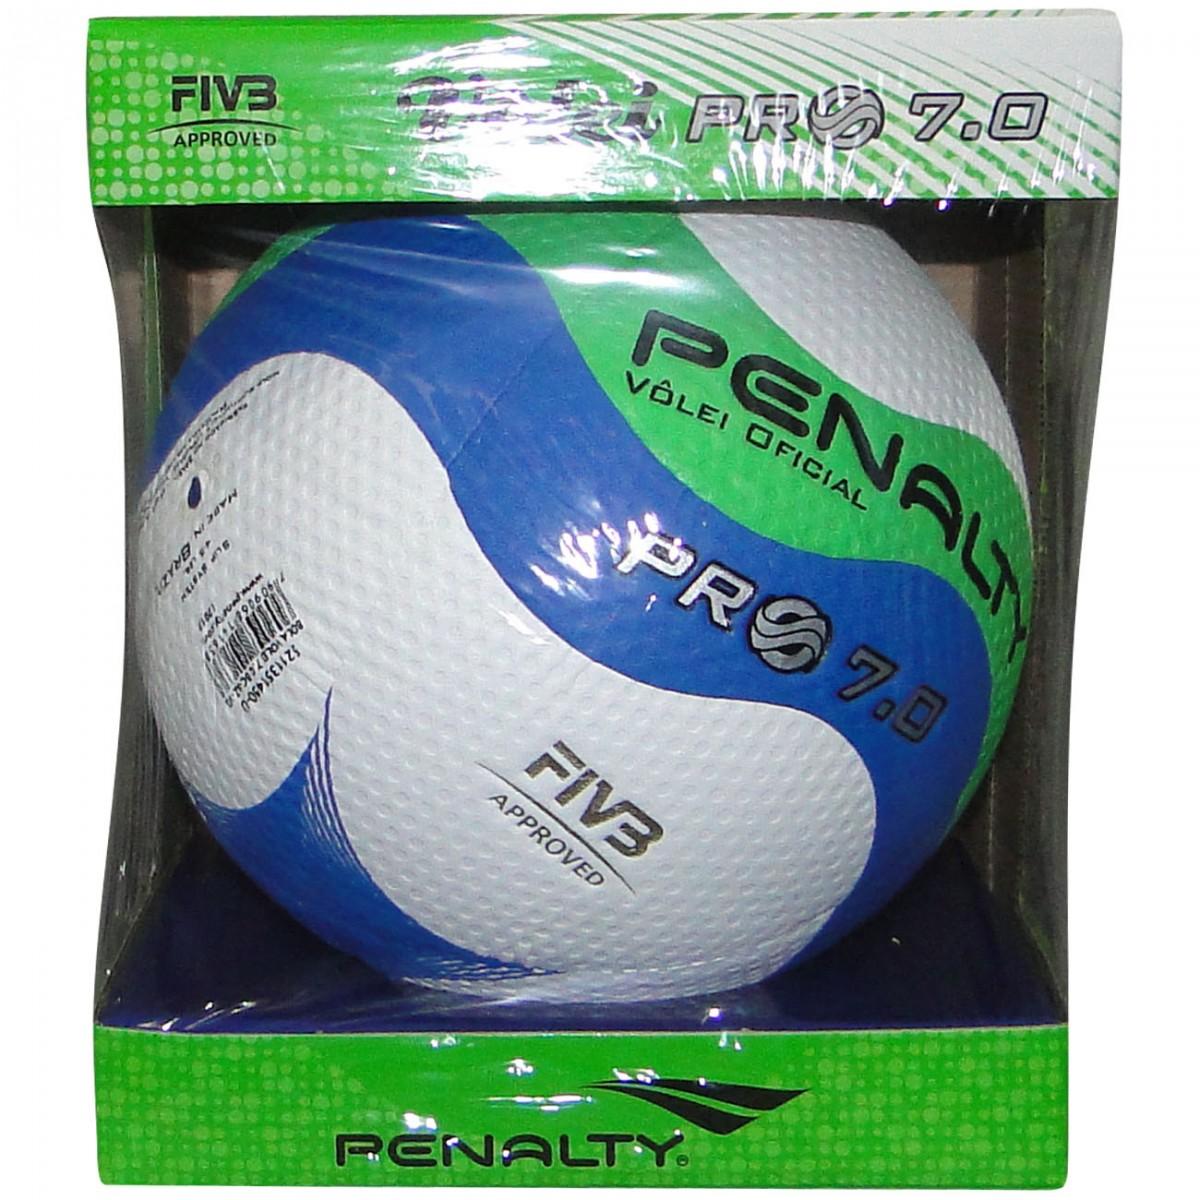 Bola Penalty Volei 7.0 Pro 8141 - Branco Azul Verde - Chuteira Nike ... 3122aa55cdbc9